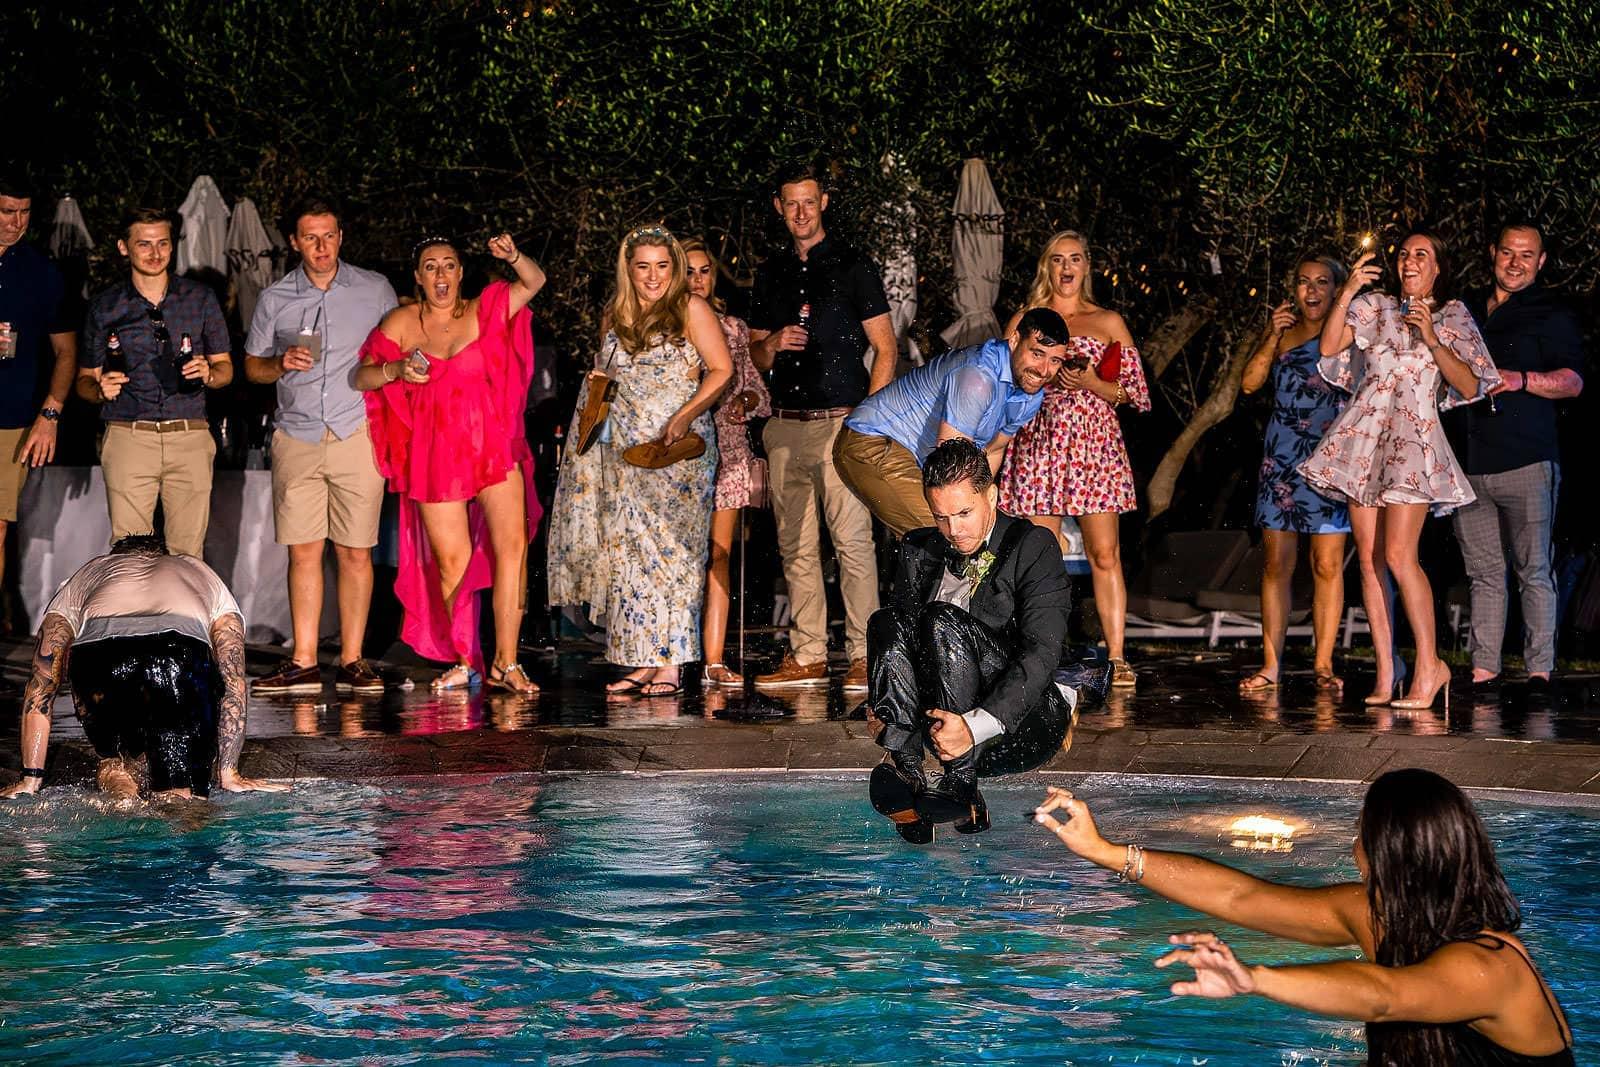 Aquapetra resort wedding by Dan Morris Photography